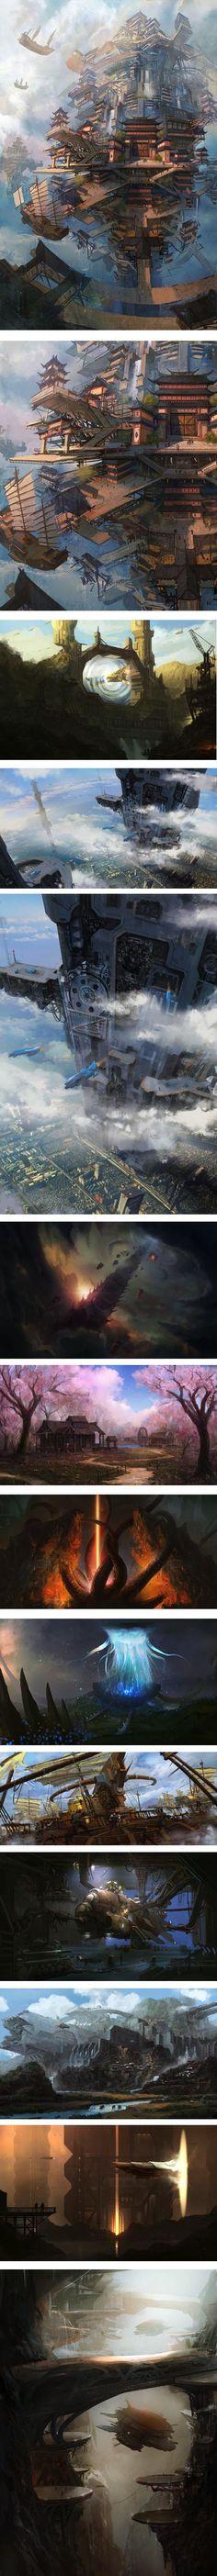 Interesting concept art